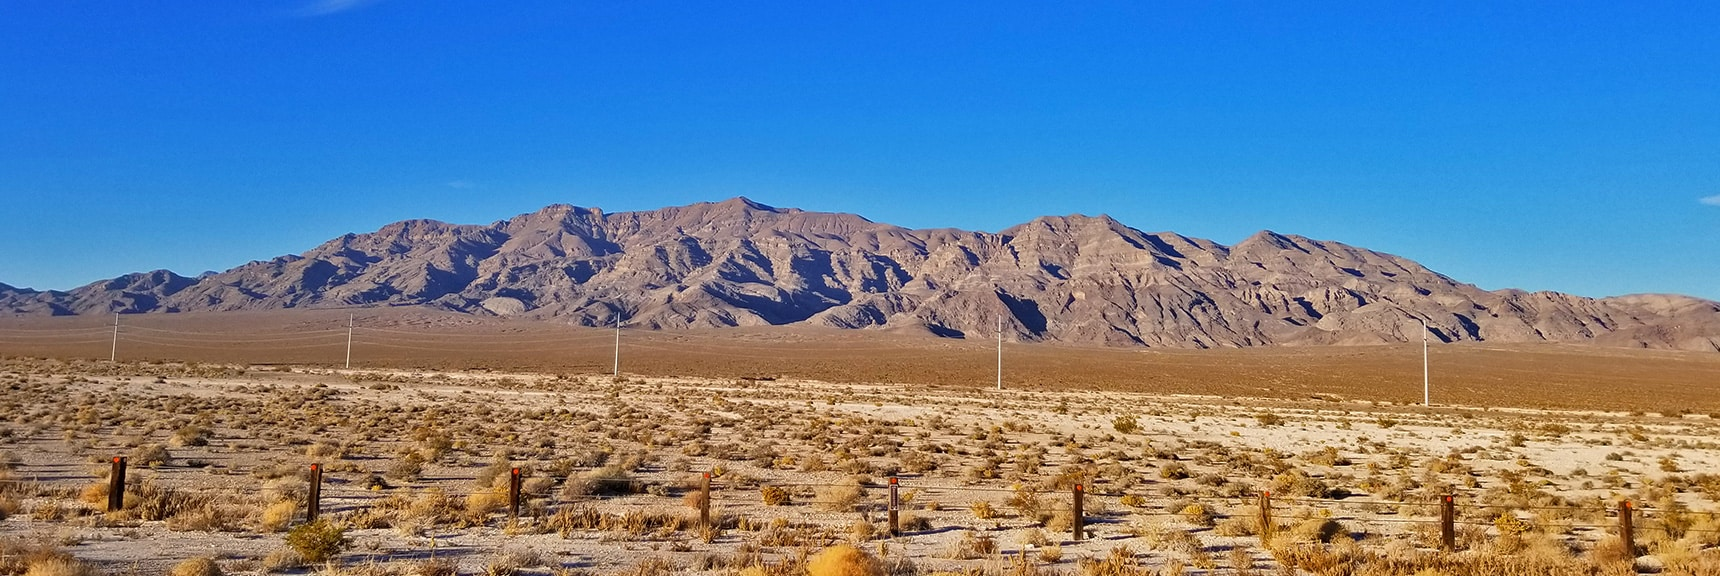 Final Look at South Side of Gass Peak from Beginning of Grand Teton Road Somewhere Above Aliente Casino. | Gass Peak Road Circuit | Desert National Wildlife Refuge | Nevada